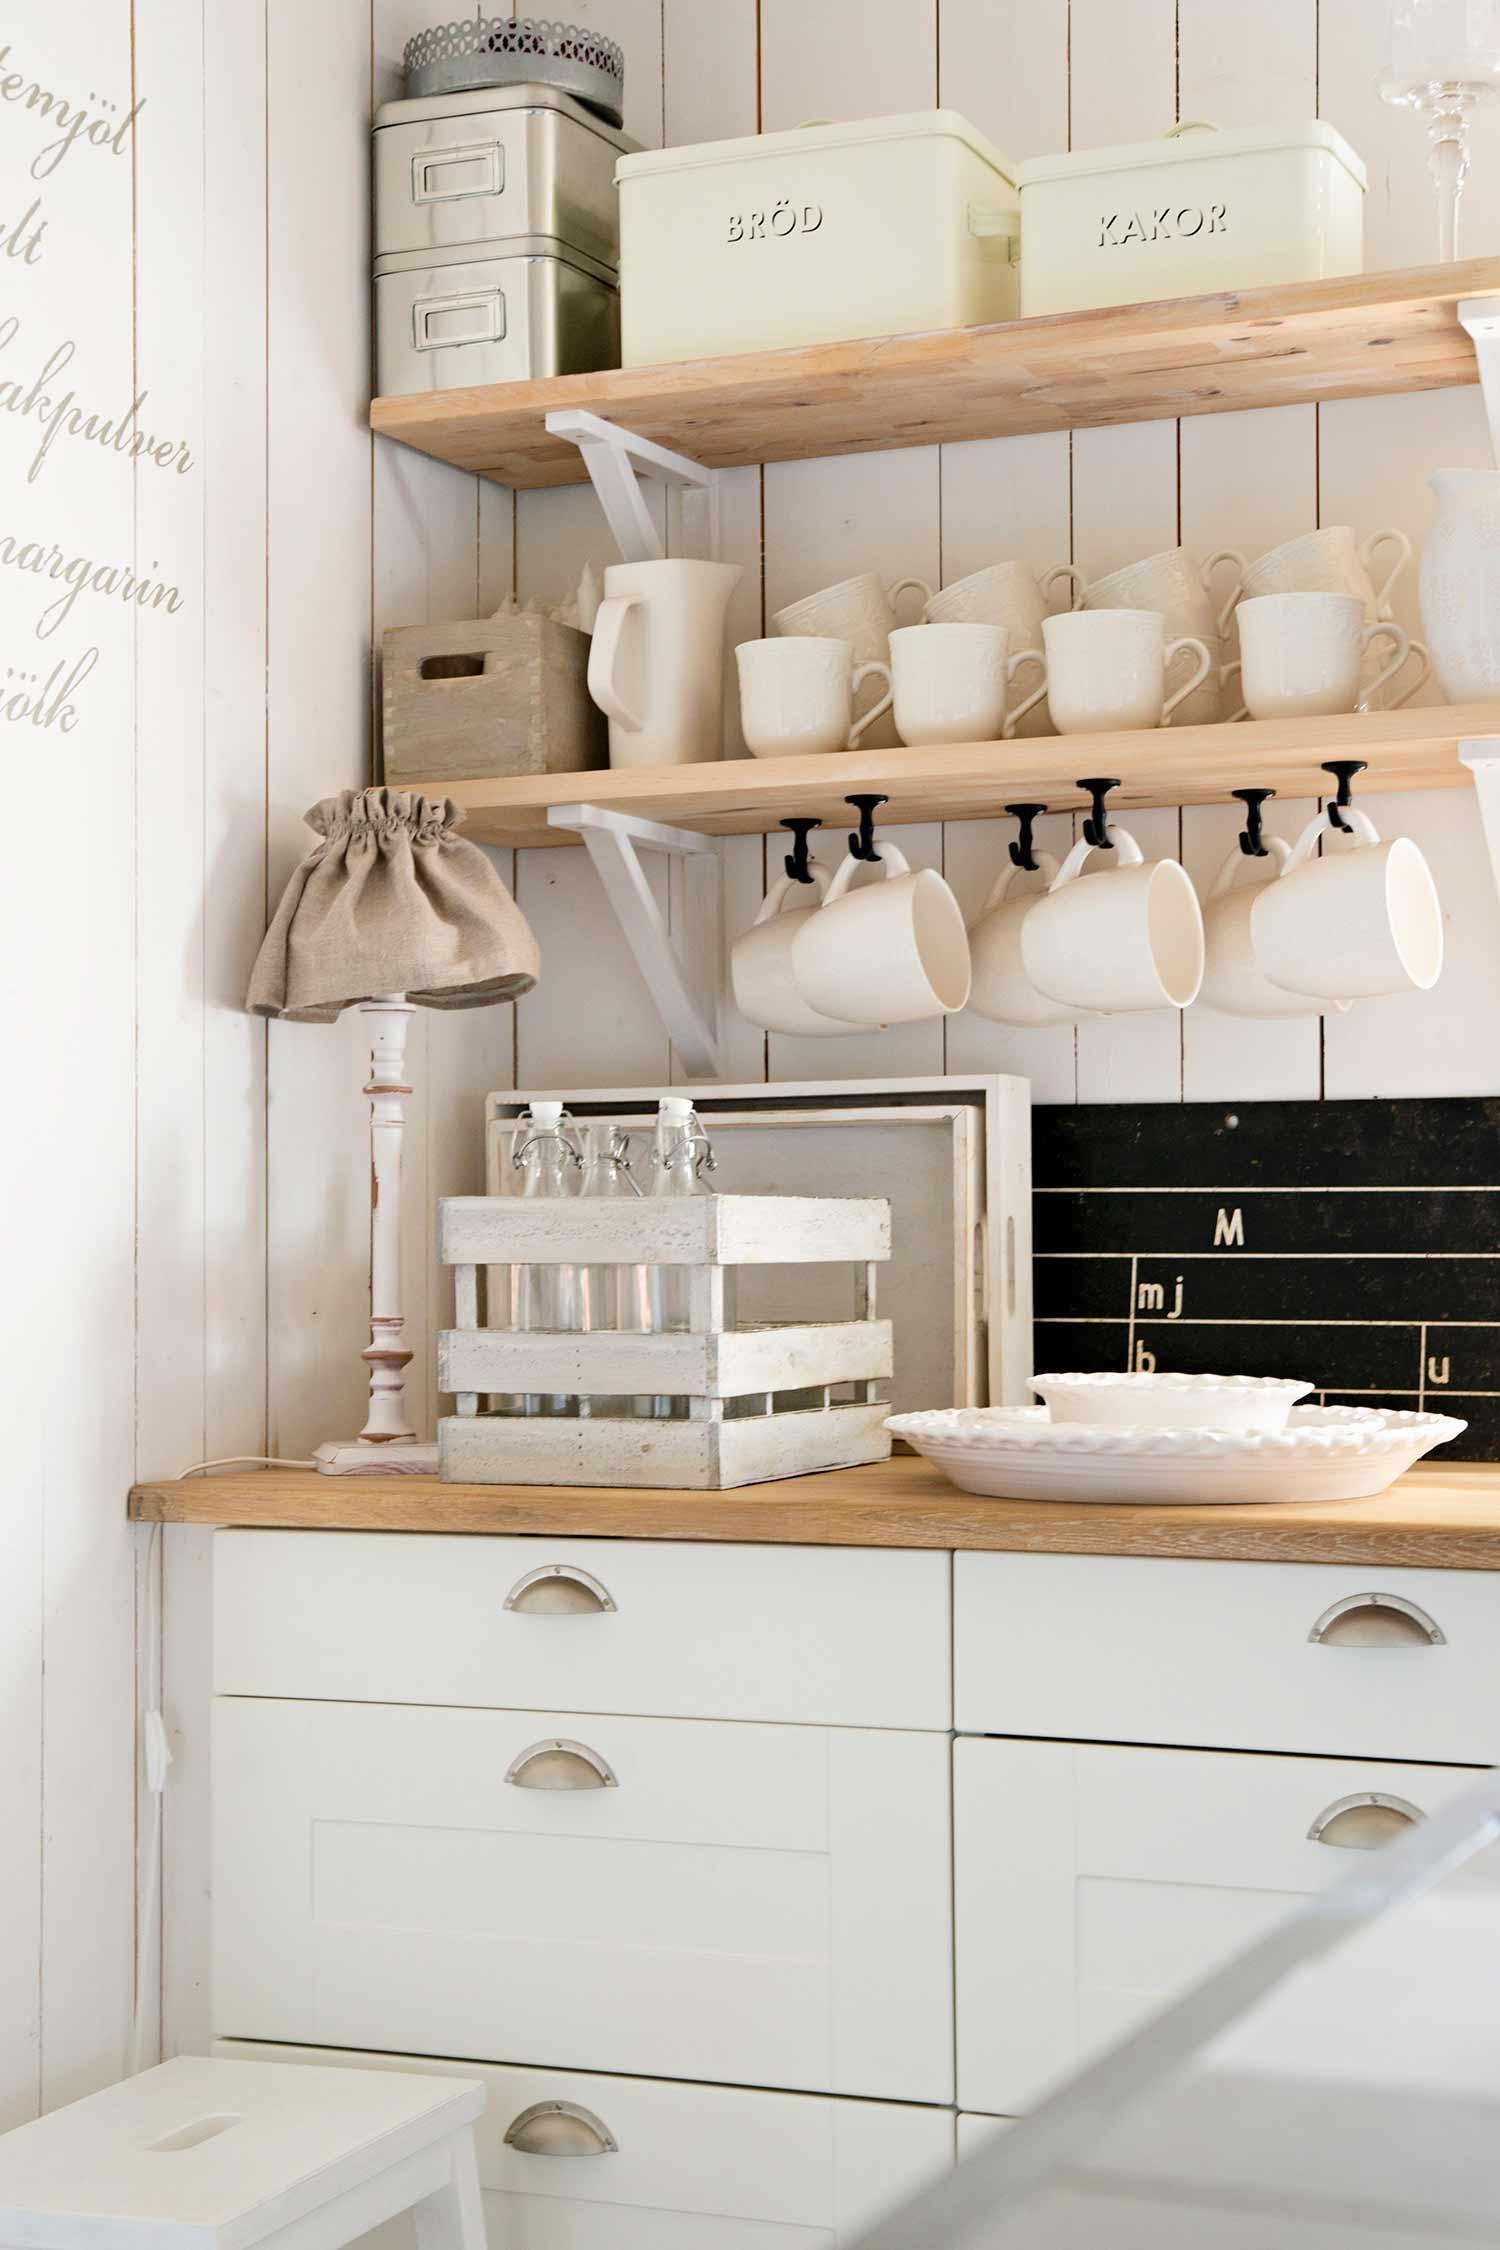 Organizzare la cucina, Cucina, Idee, Arredamento